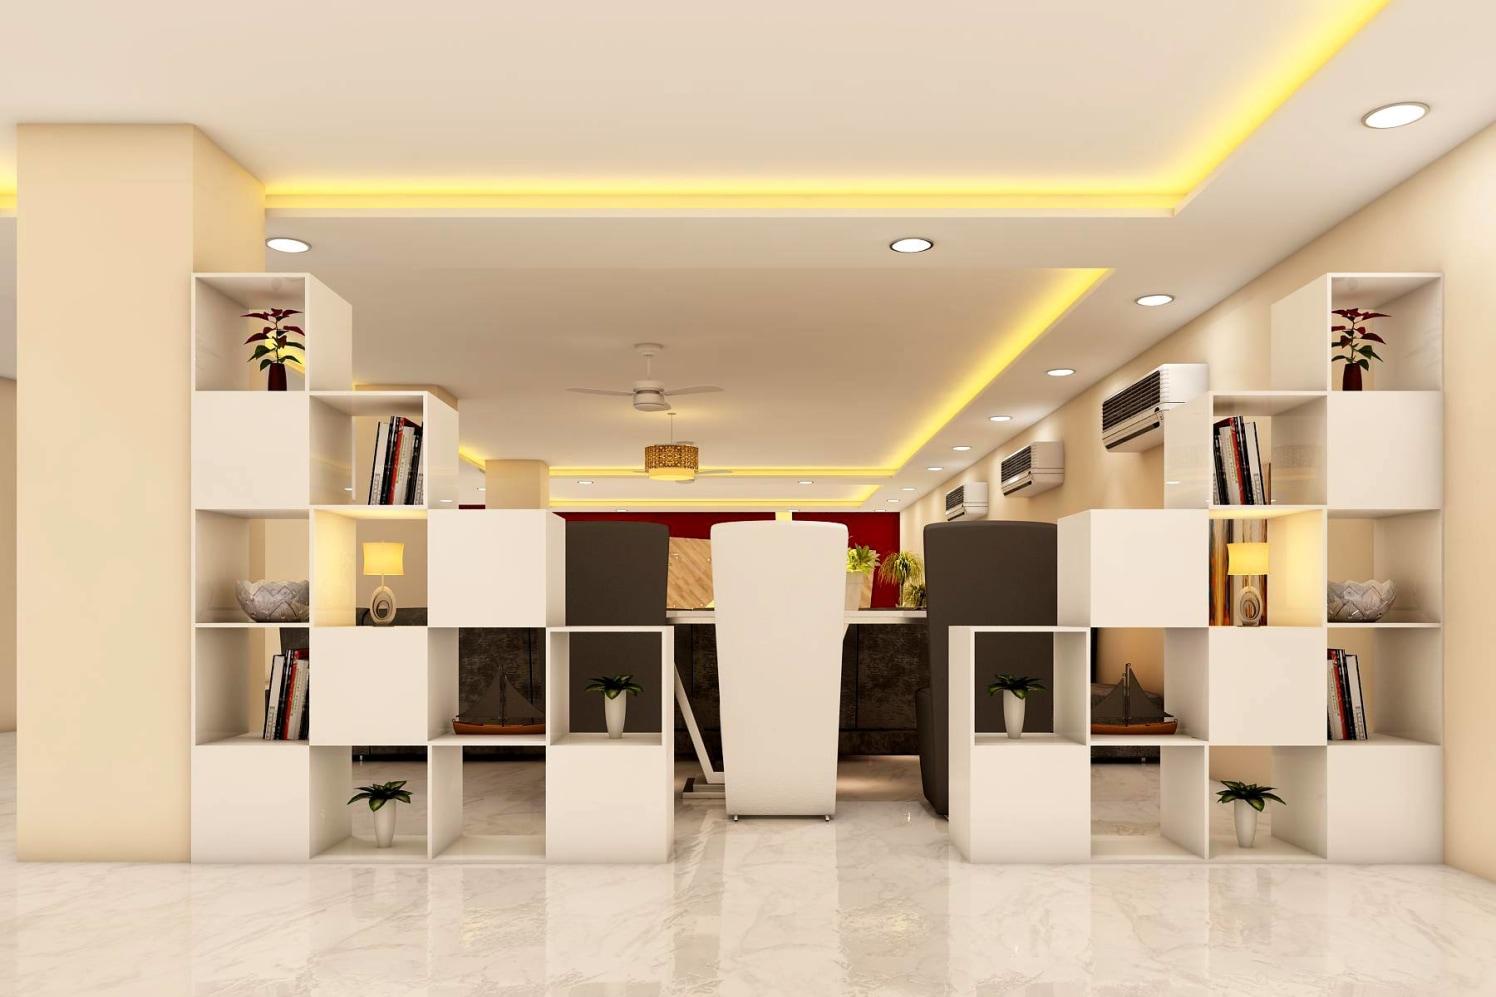 Sunny Glam by Wall Designs Contemporary | Interior Design Photos & Ideas